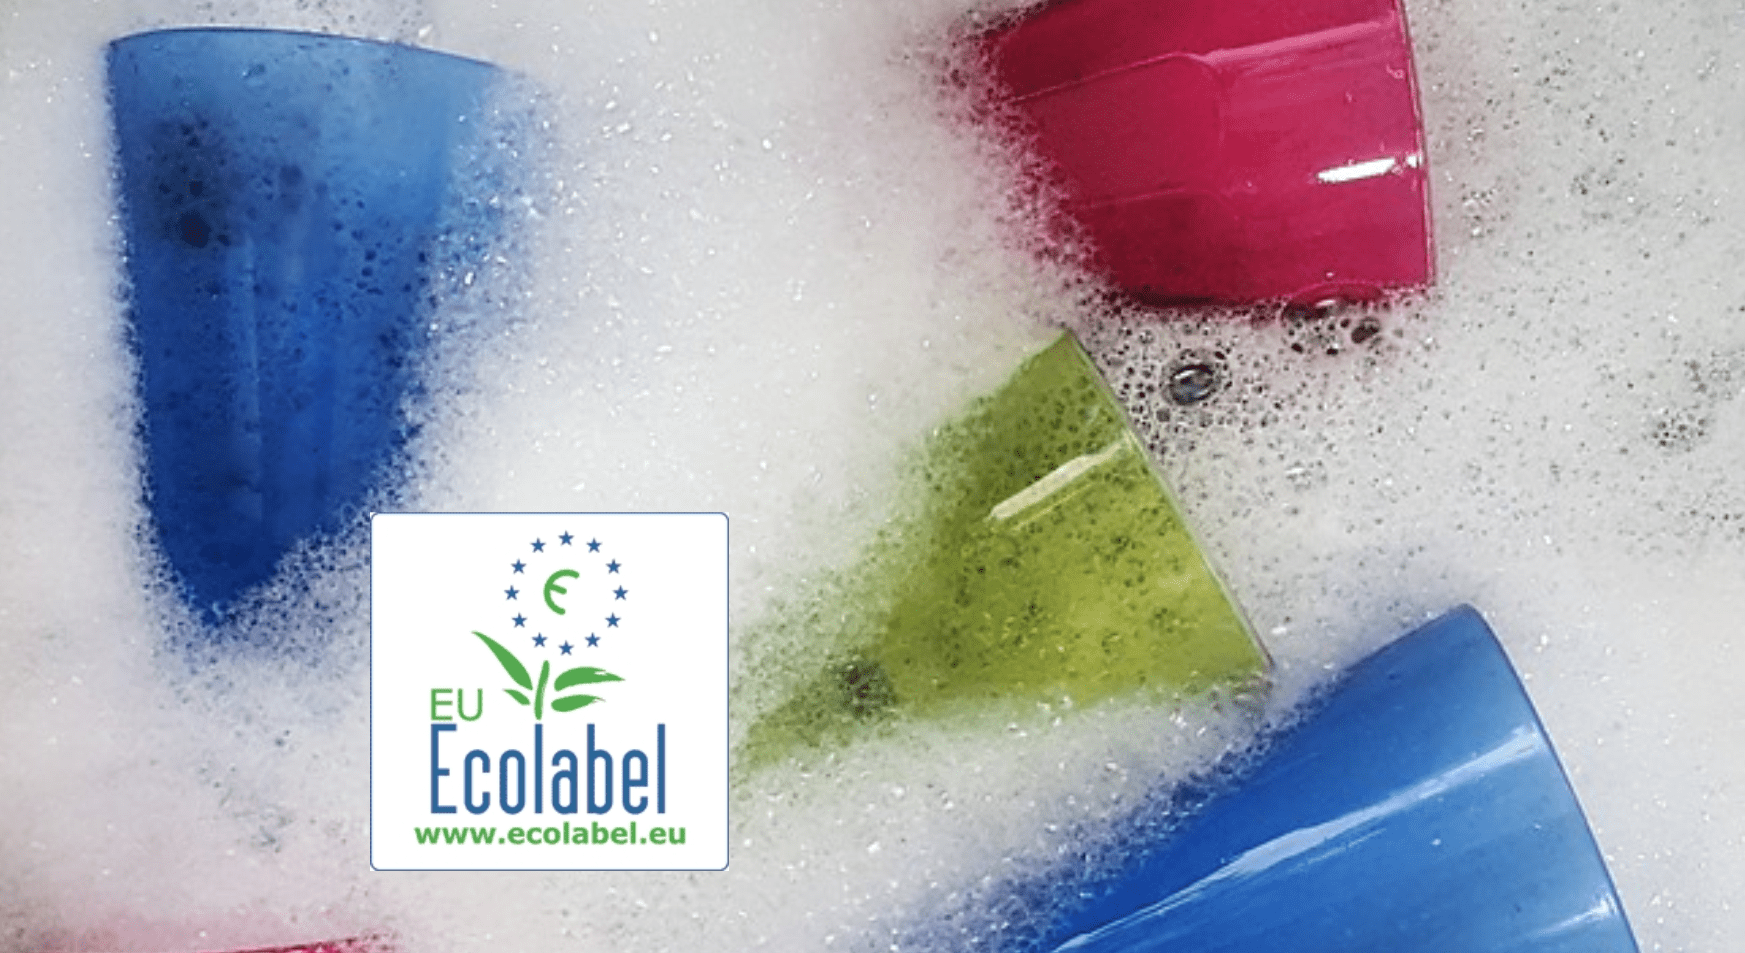 ecolabel-detergenty_3